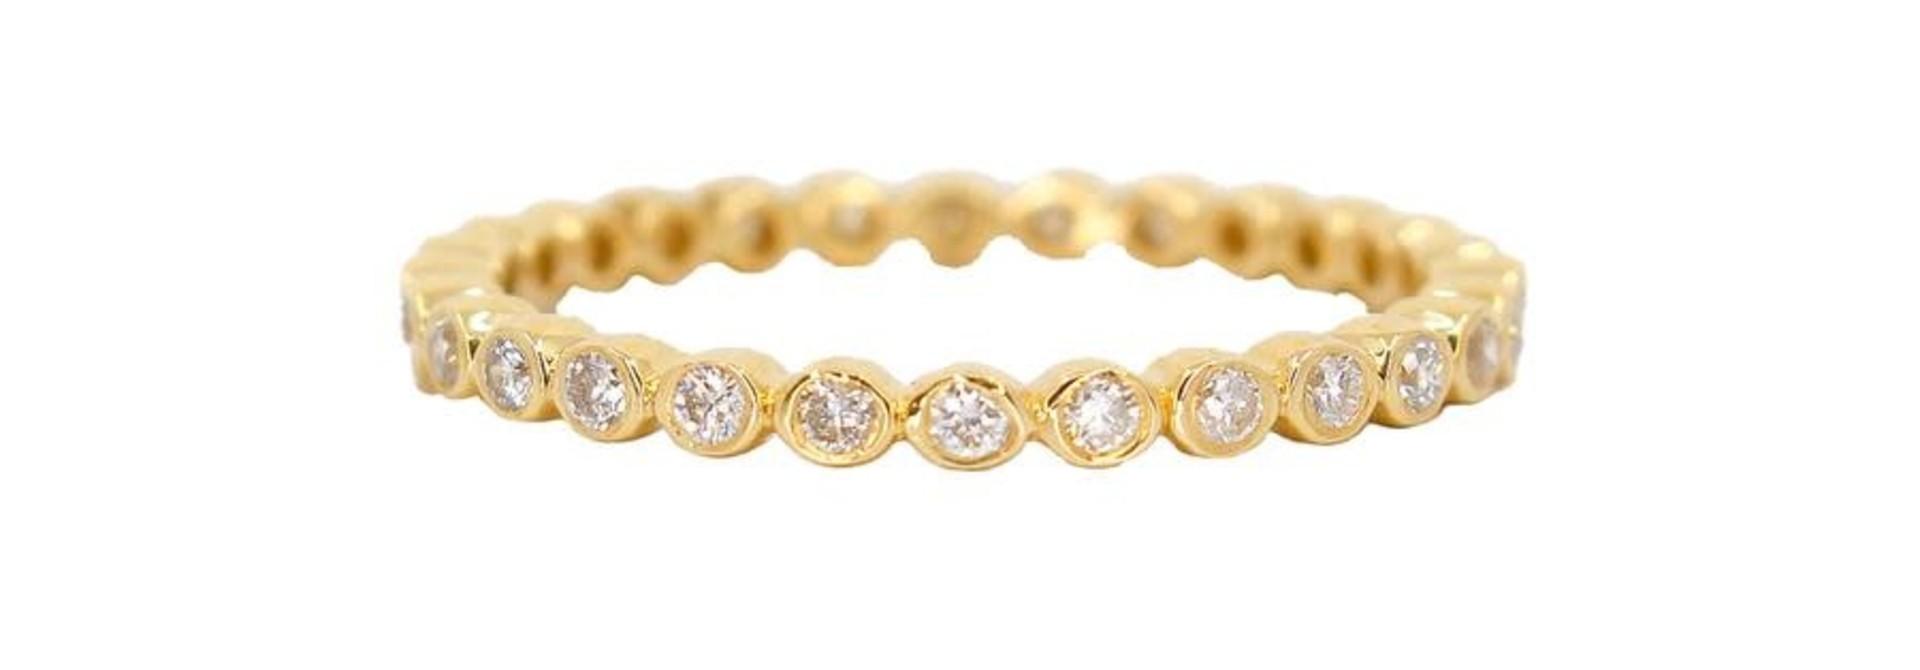 MMJ 14K ROSE GOLD DIAMOND RING